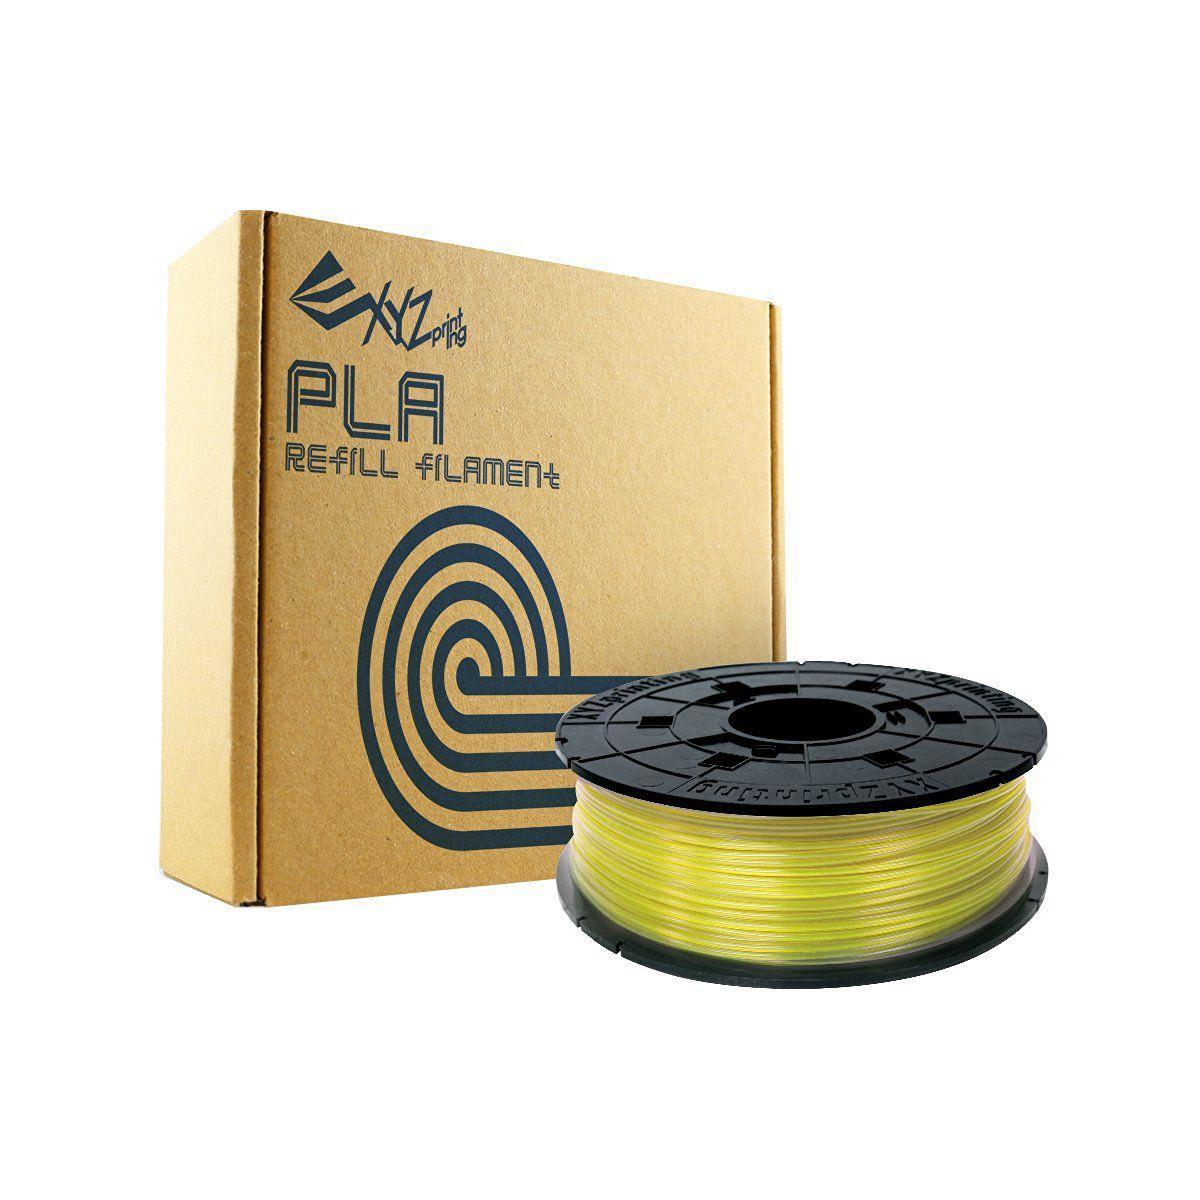 Filament 3d xyz printing bobine recharge pla jaune clair - 2% ...